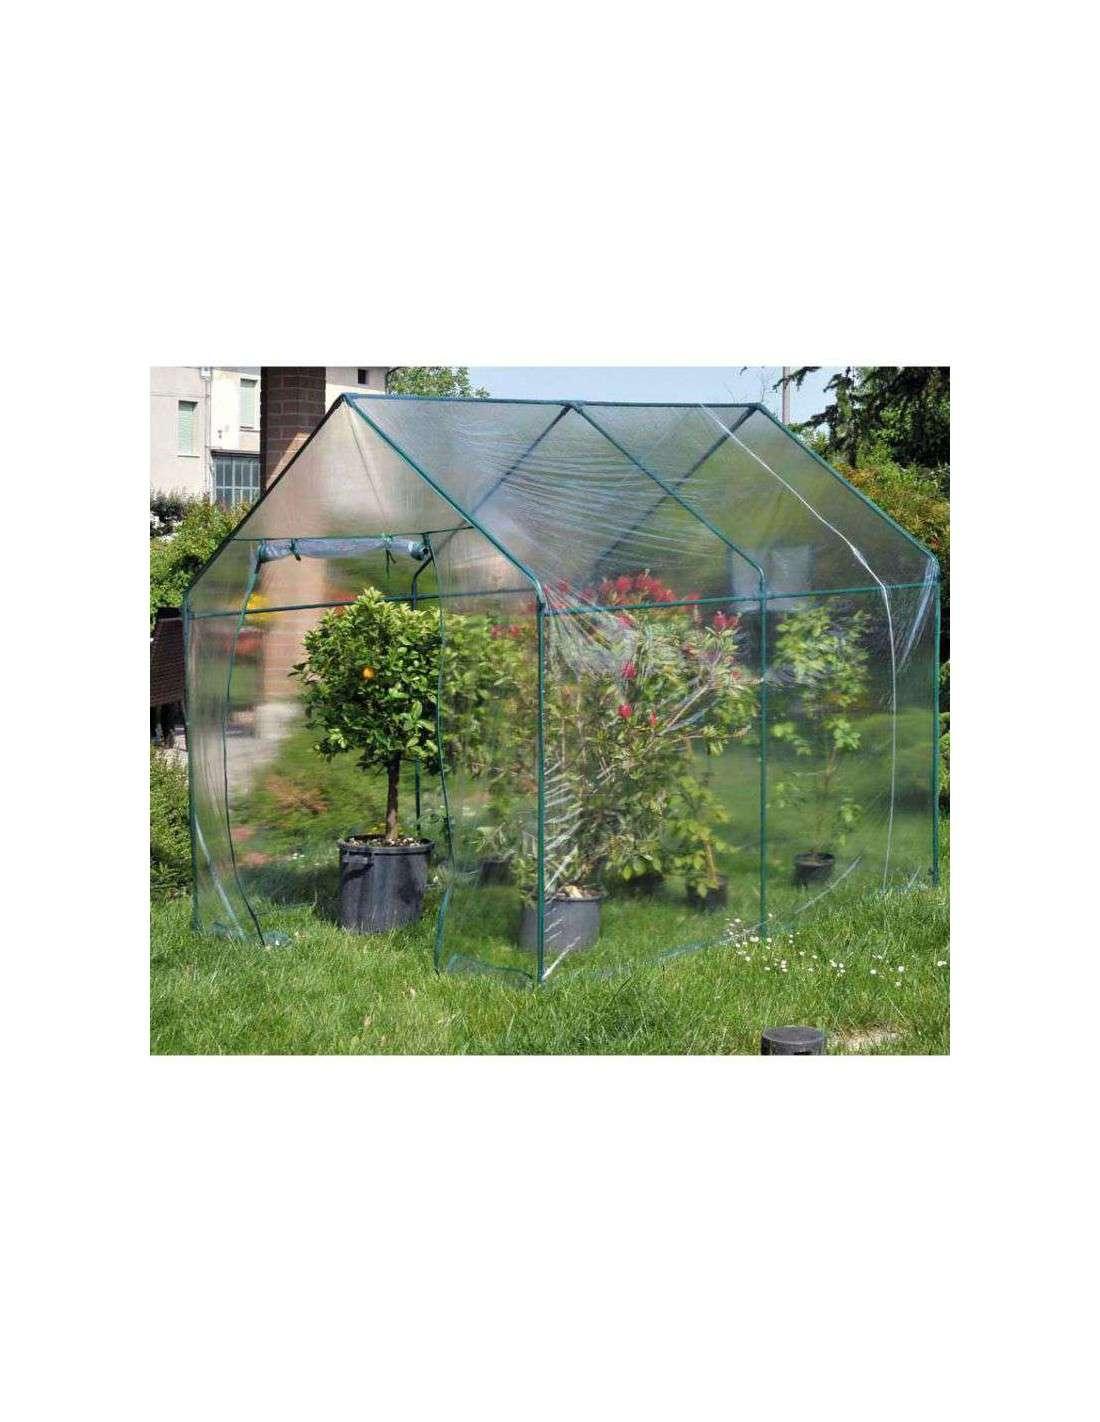 Invernadero jard n 185x240 cm en cocopot for Invernaderos para jardin